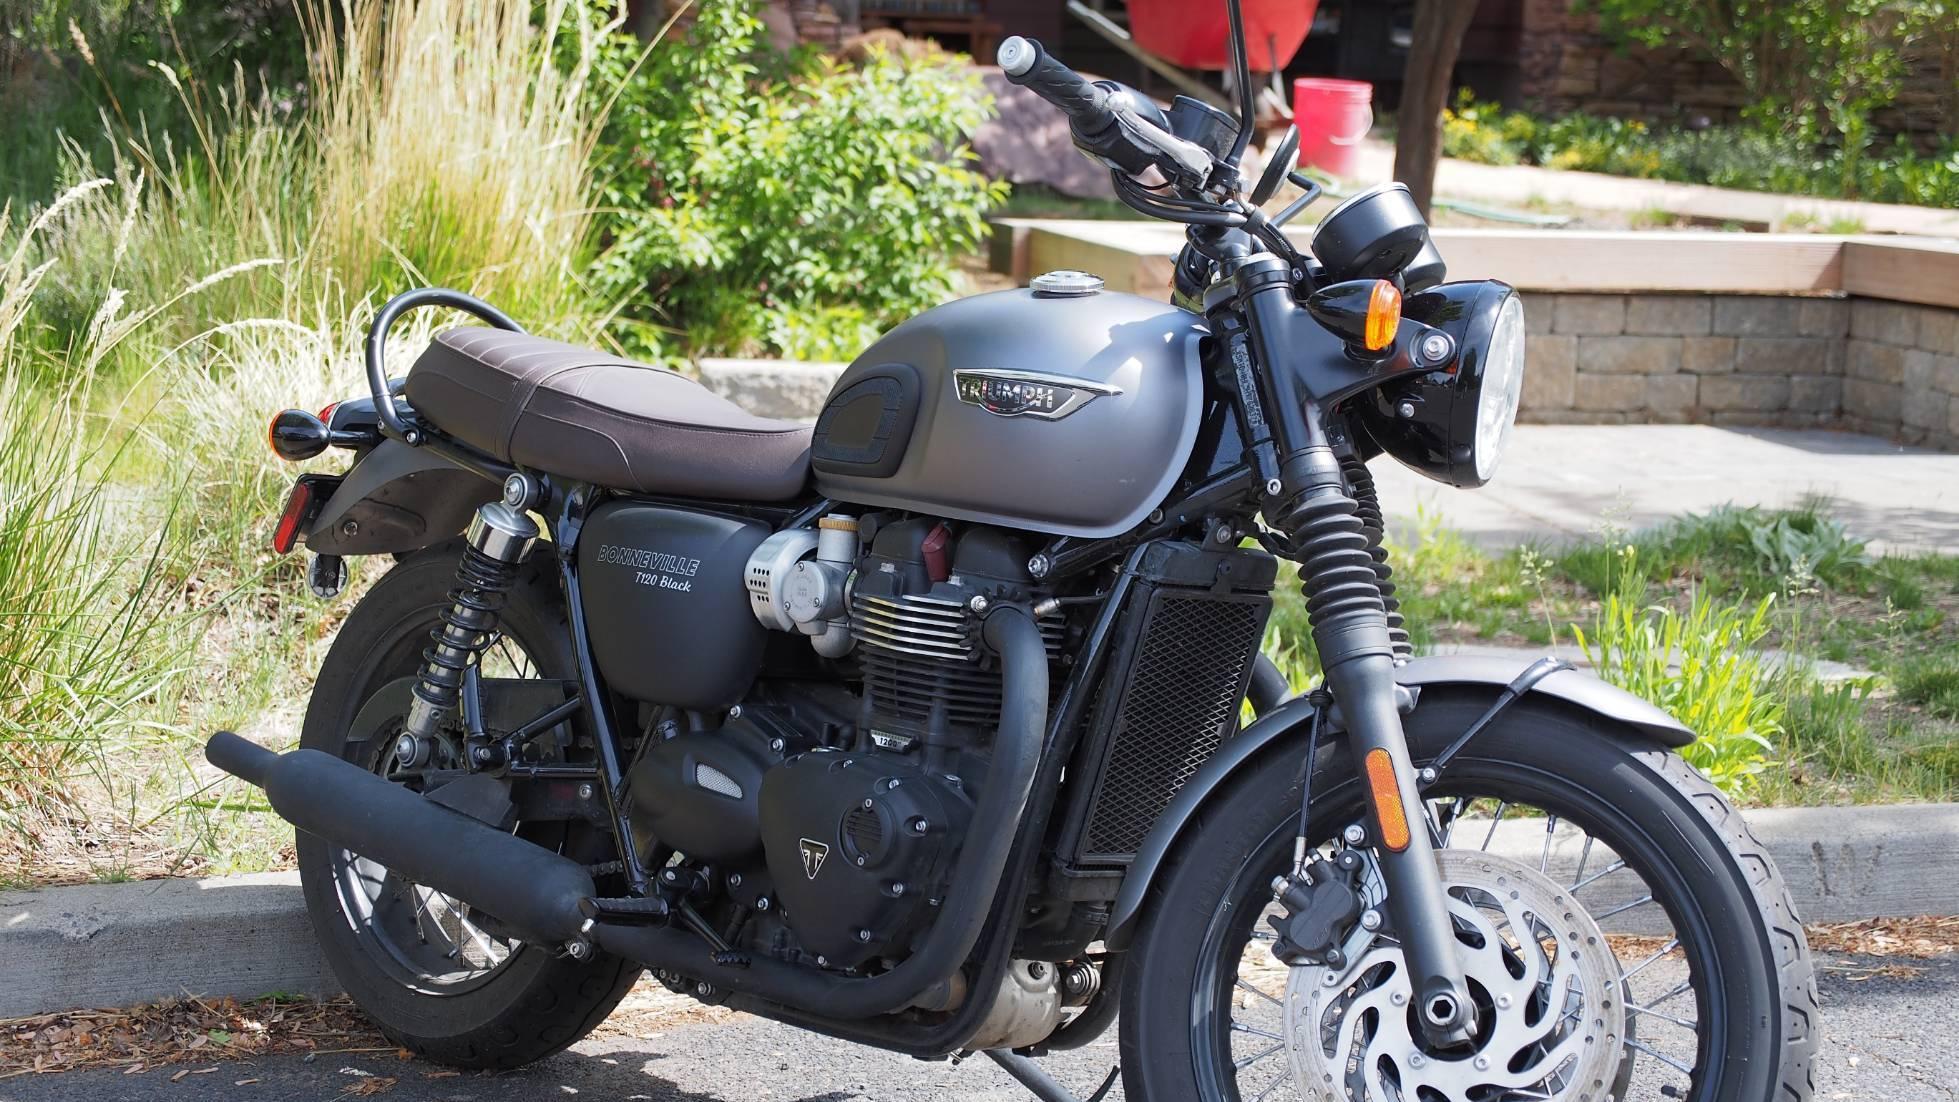 Triumph Bonneville T120 Black For Rent Near Bend Oregon Riders Share